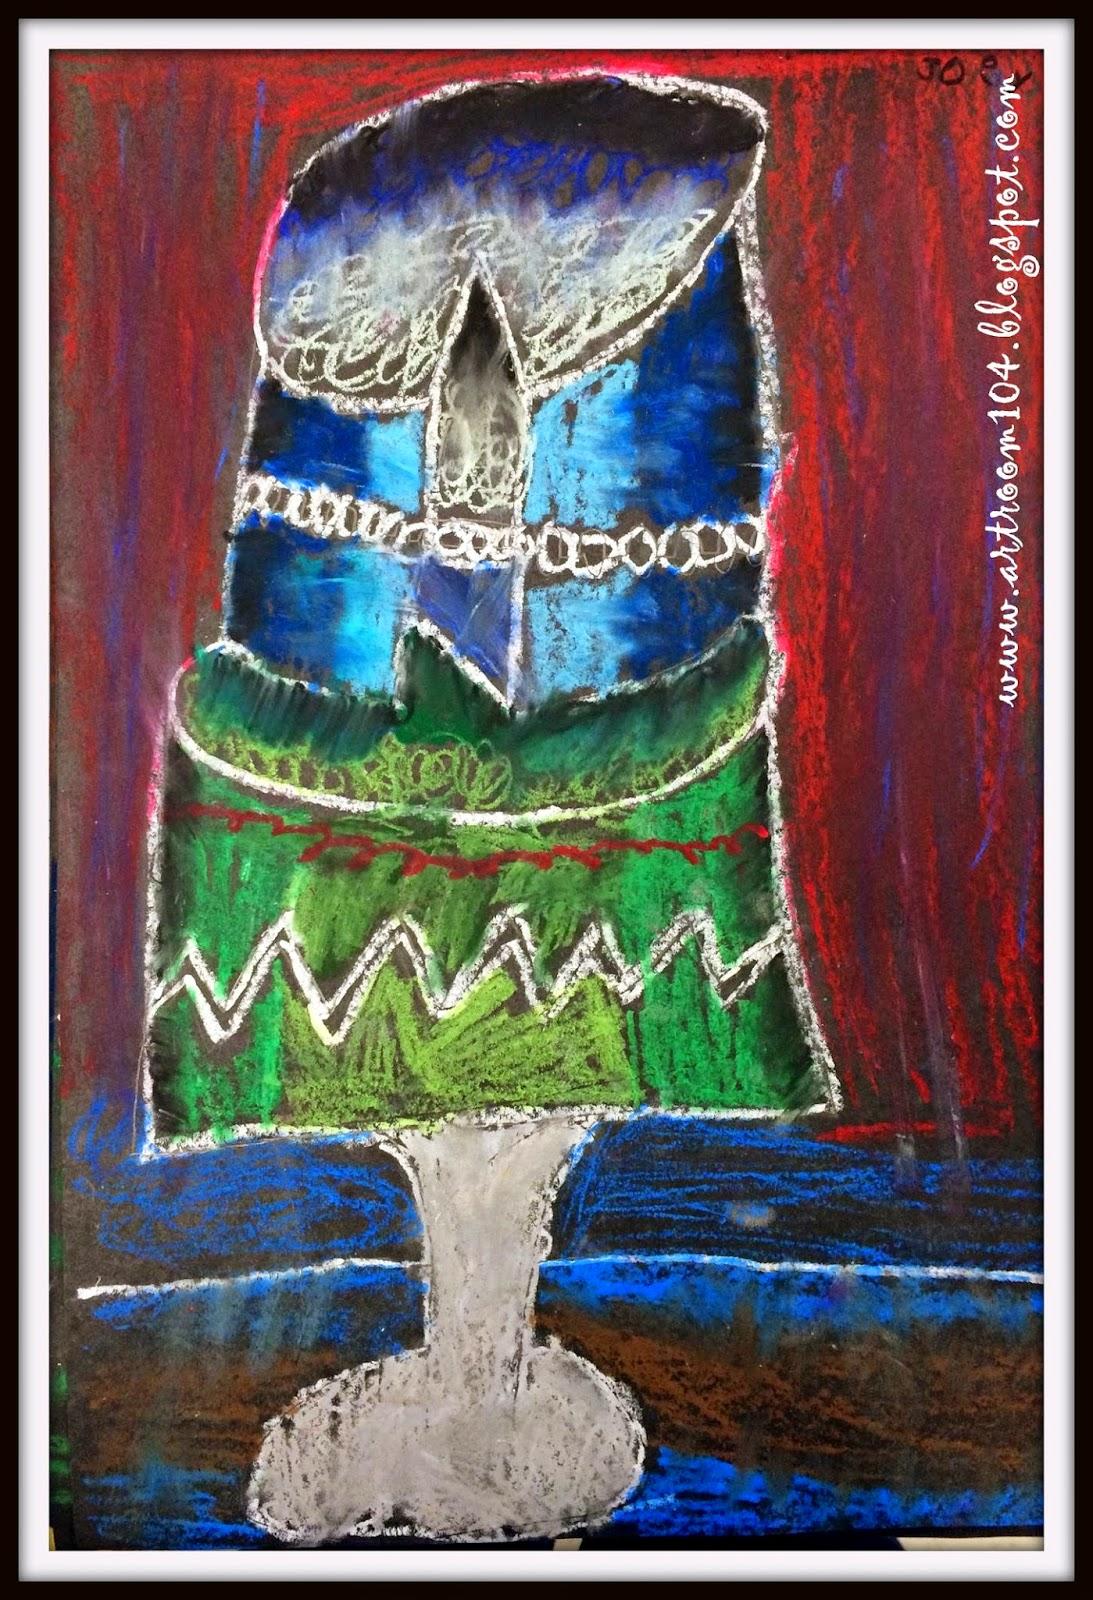 Art Room 104: January 2015